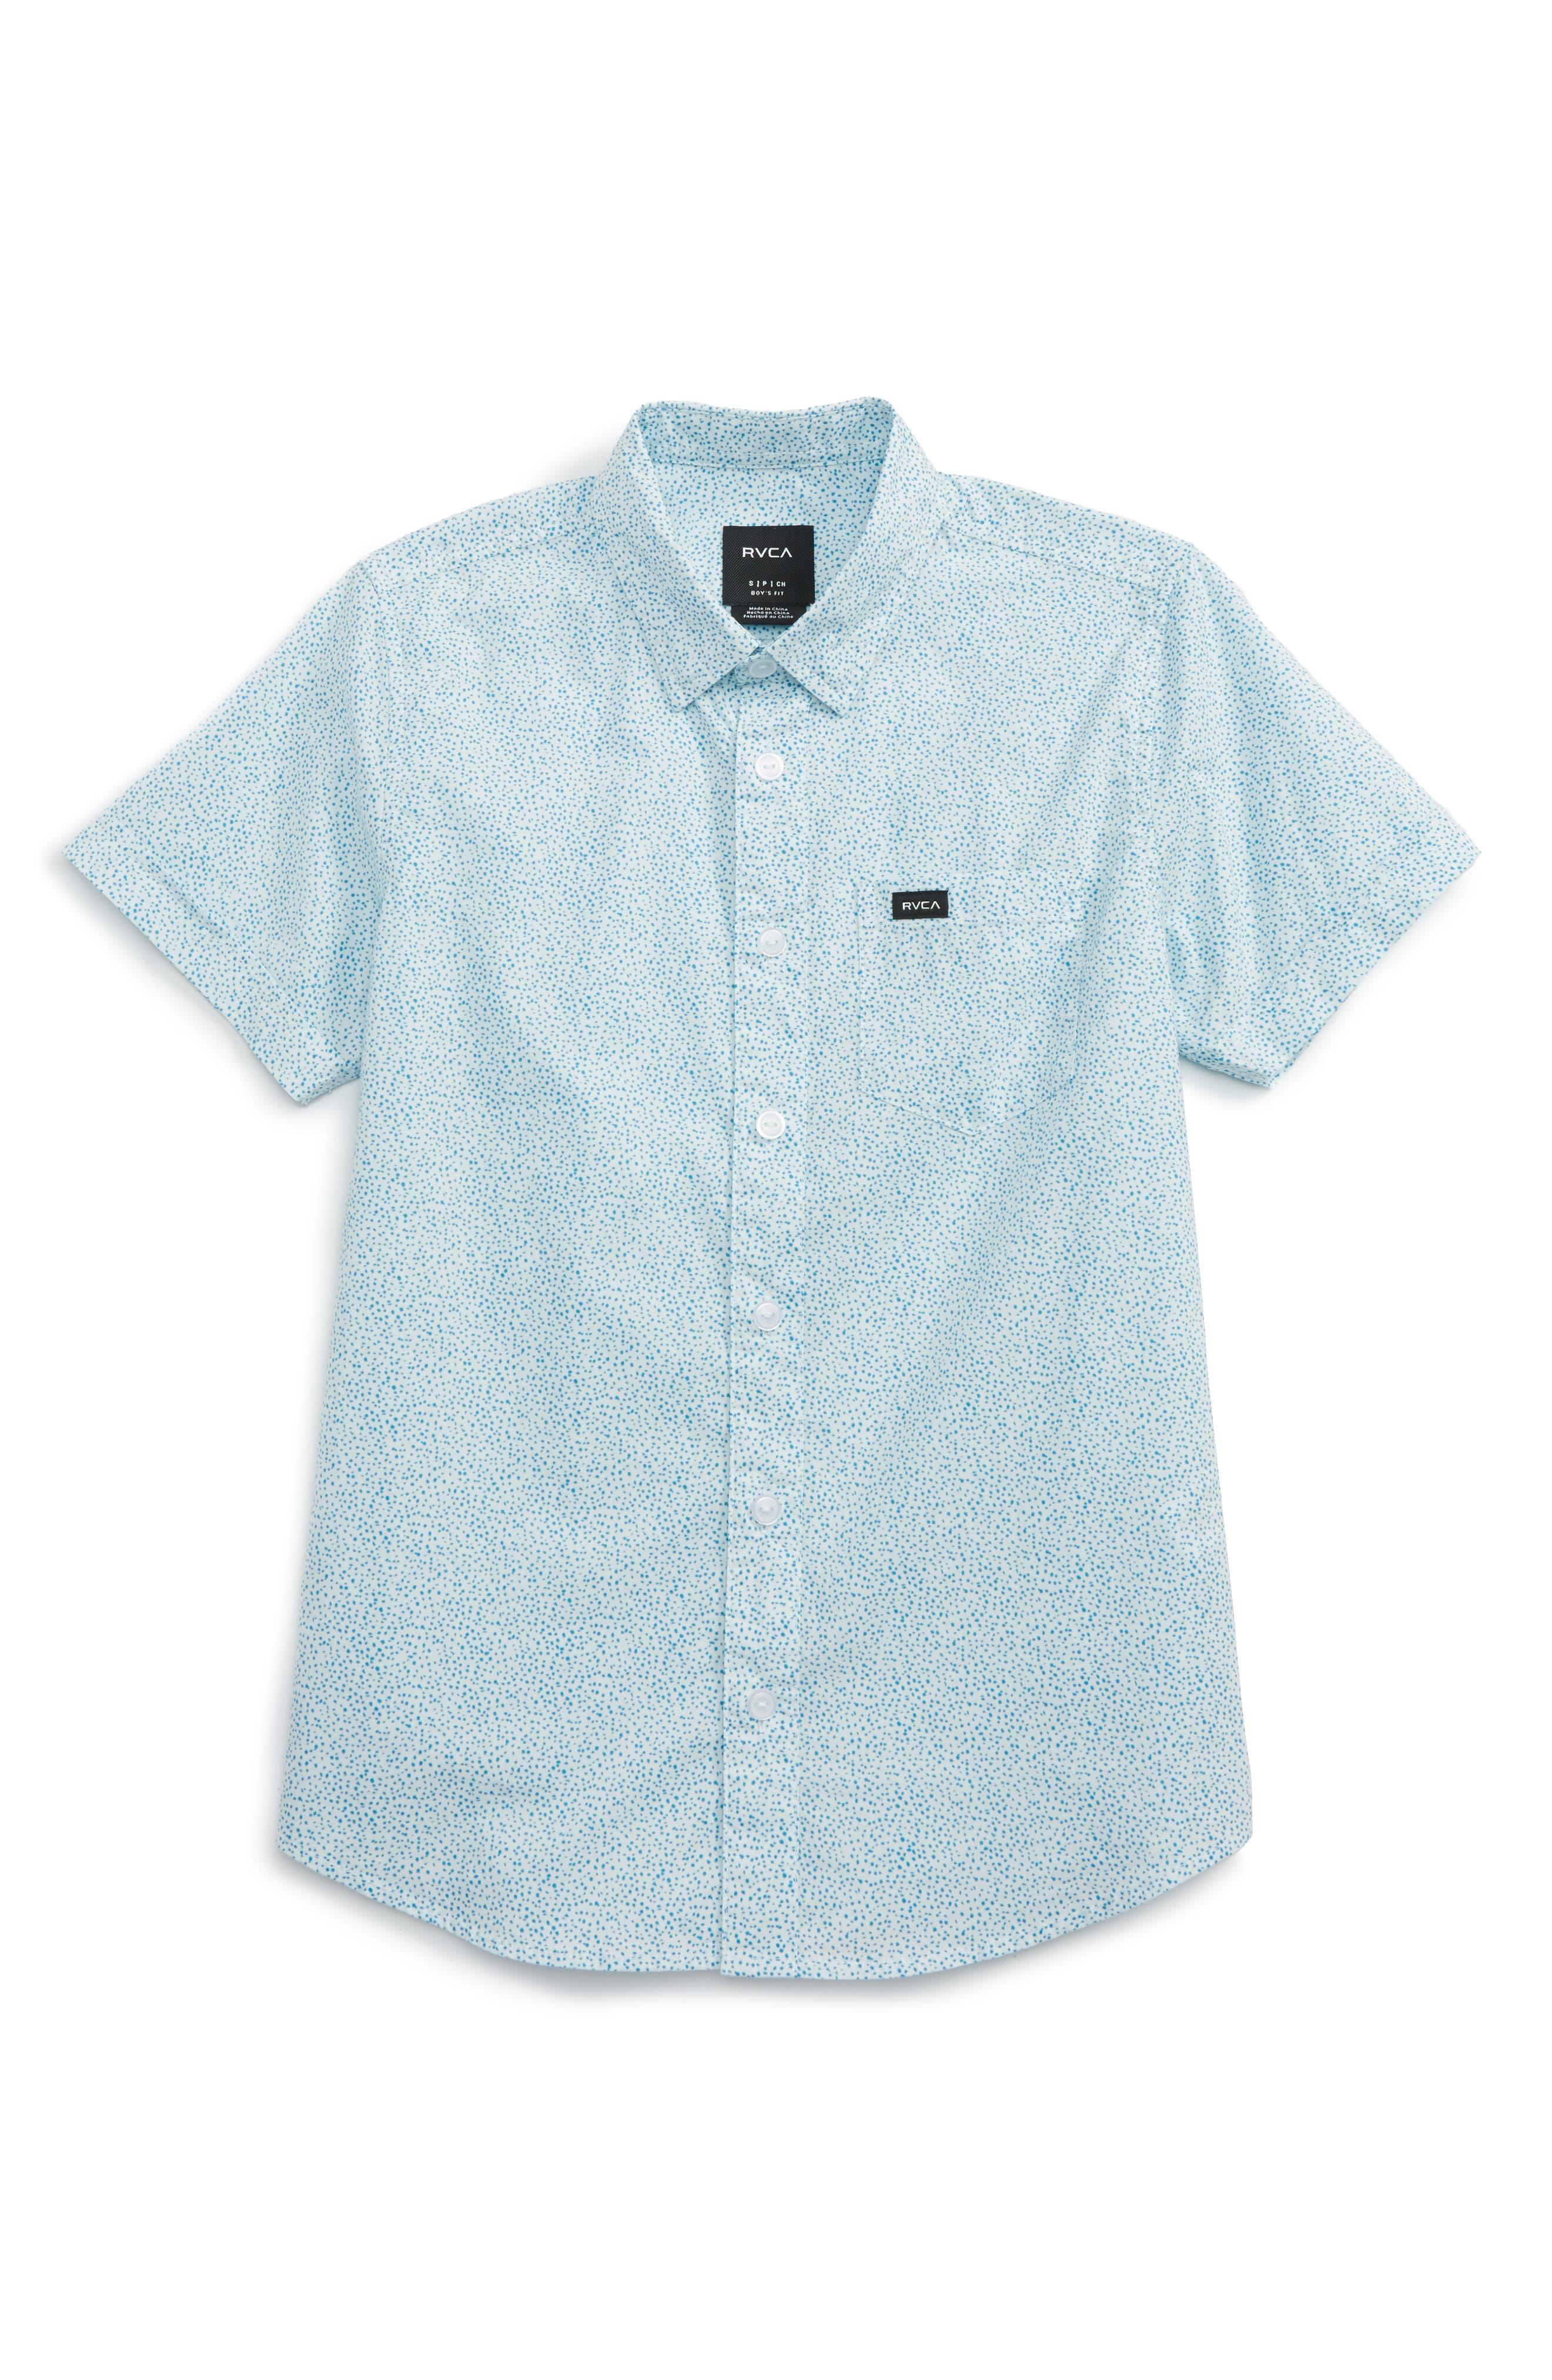 RVCA Speckles Woven Shirt (Big Boys)